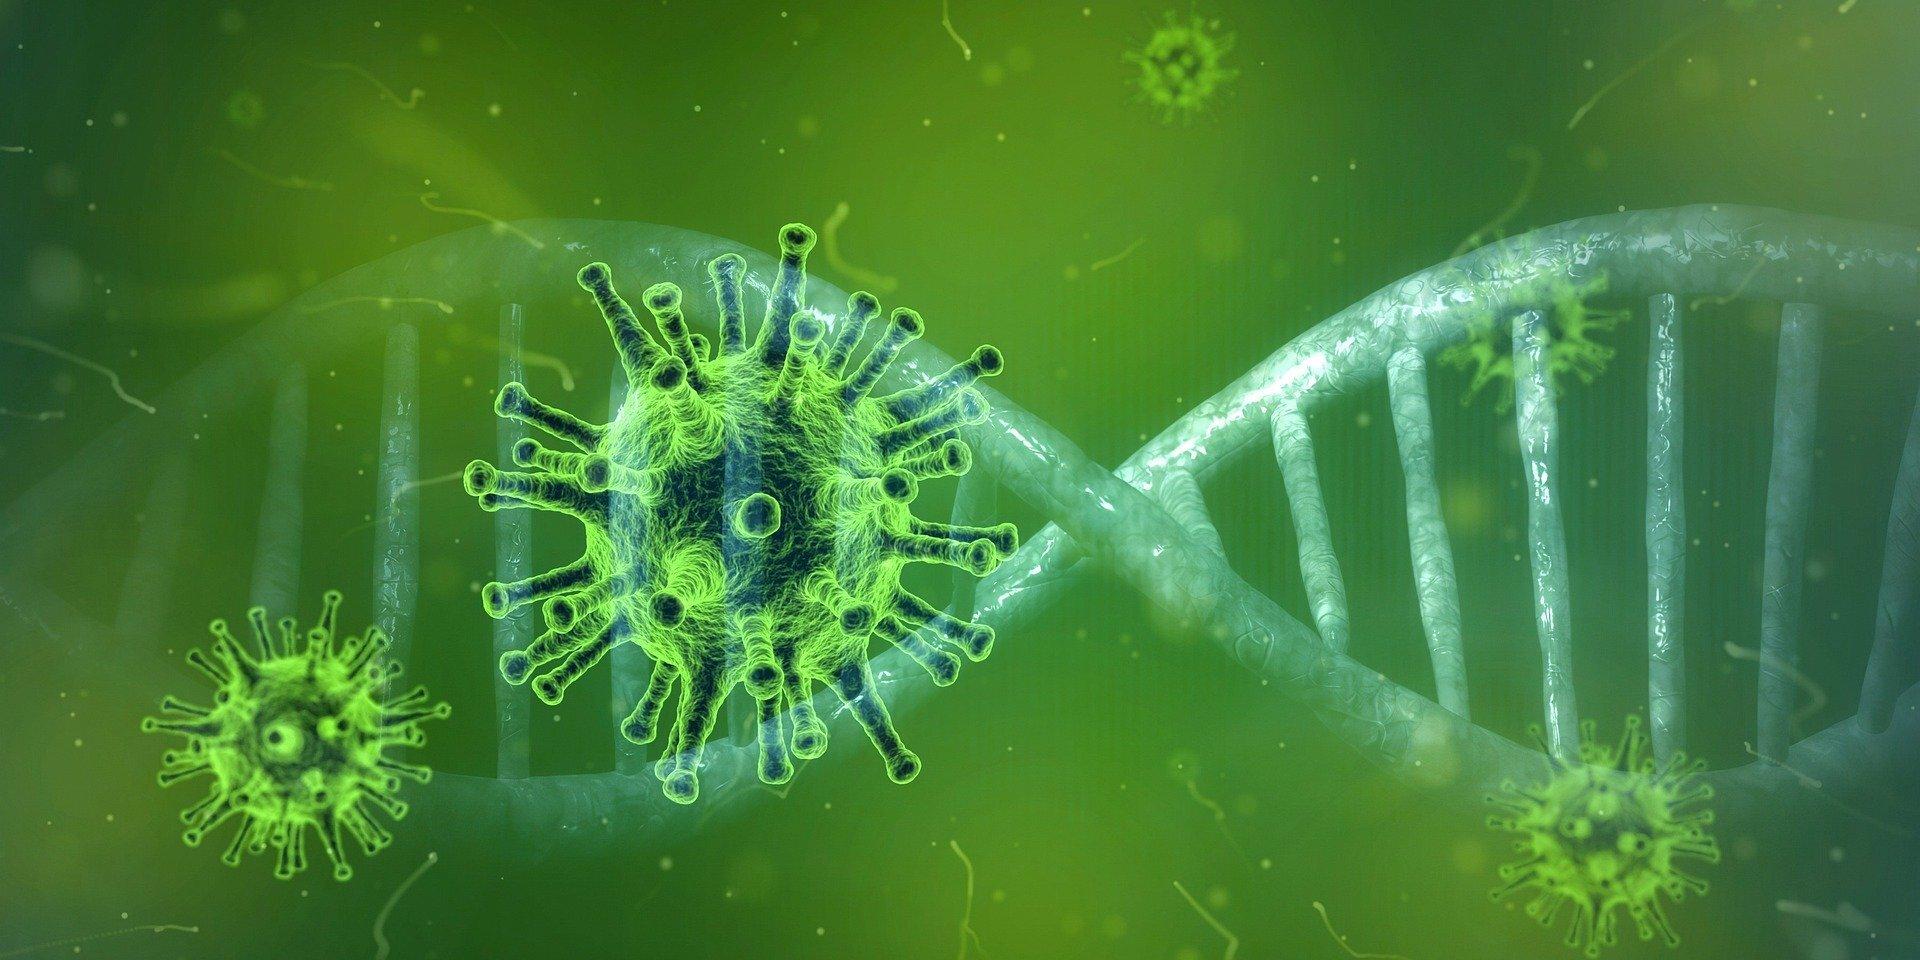 Ray Comfort on The Coronavirus and Self-Fulfilling Prophecy